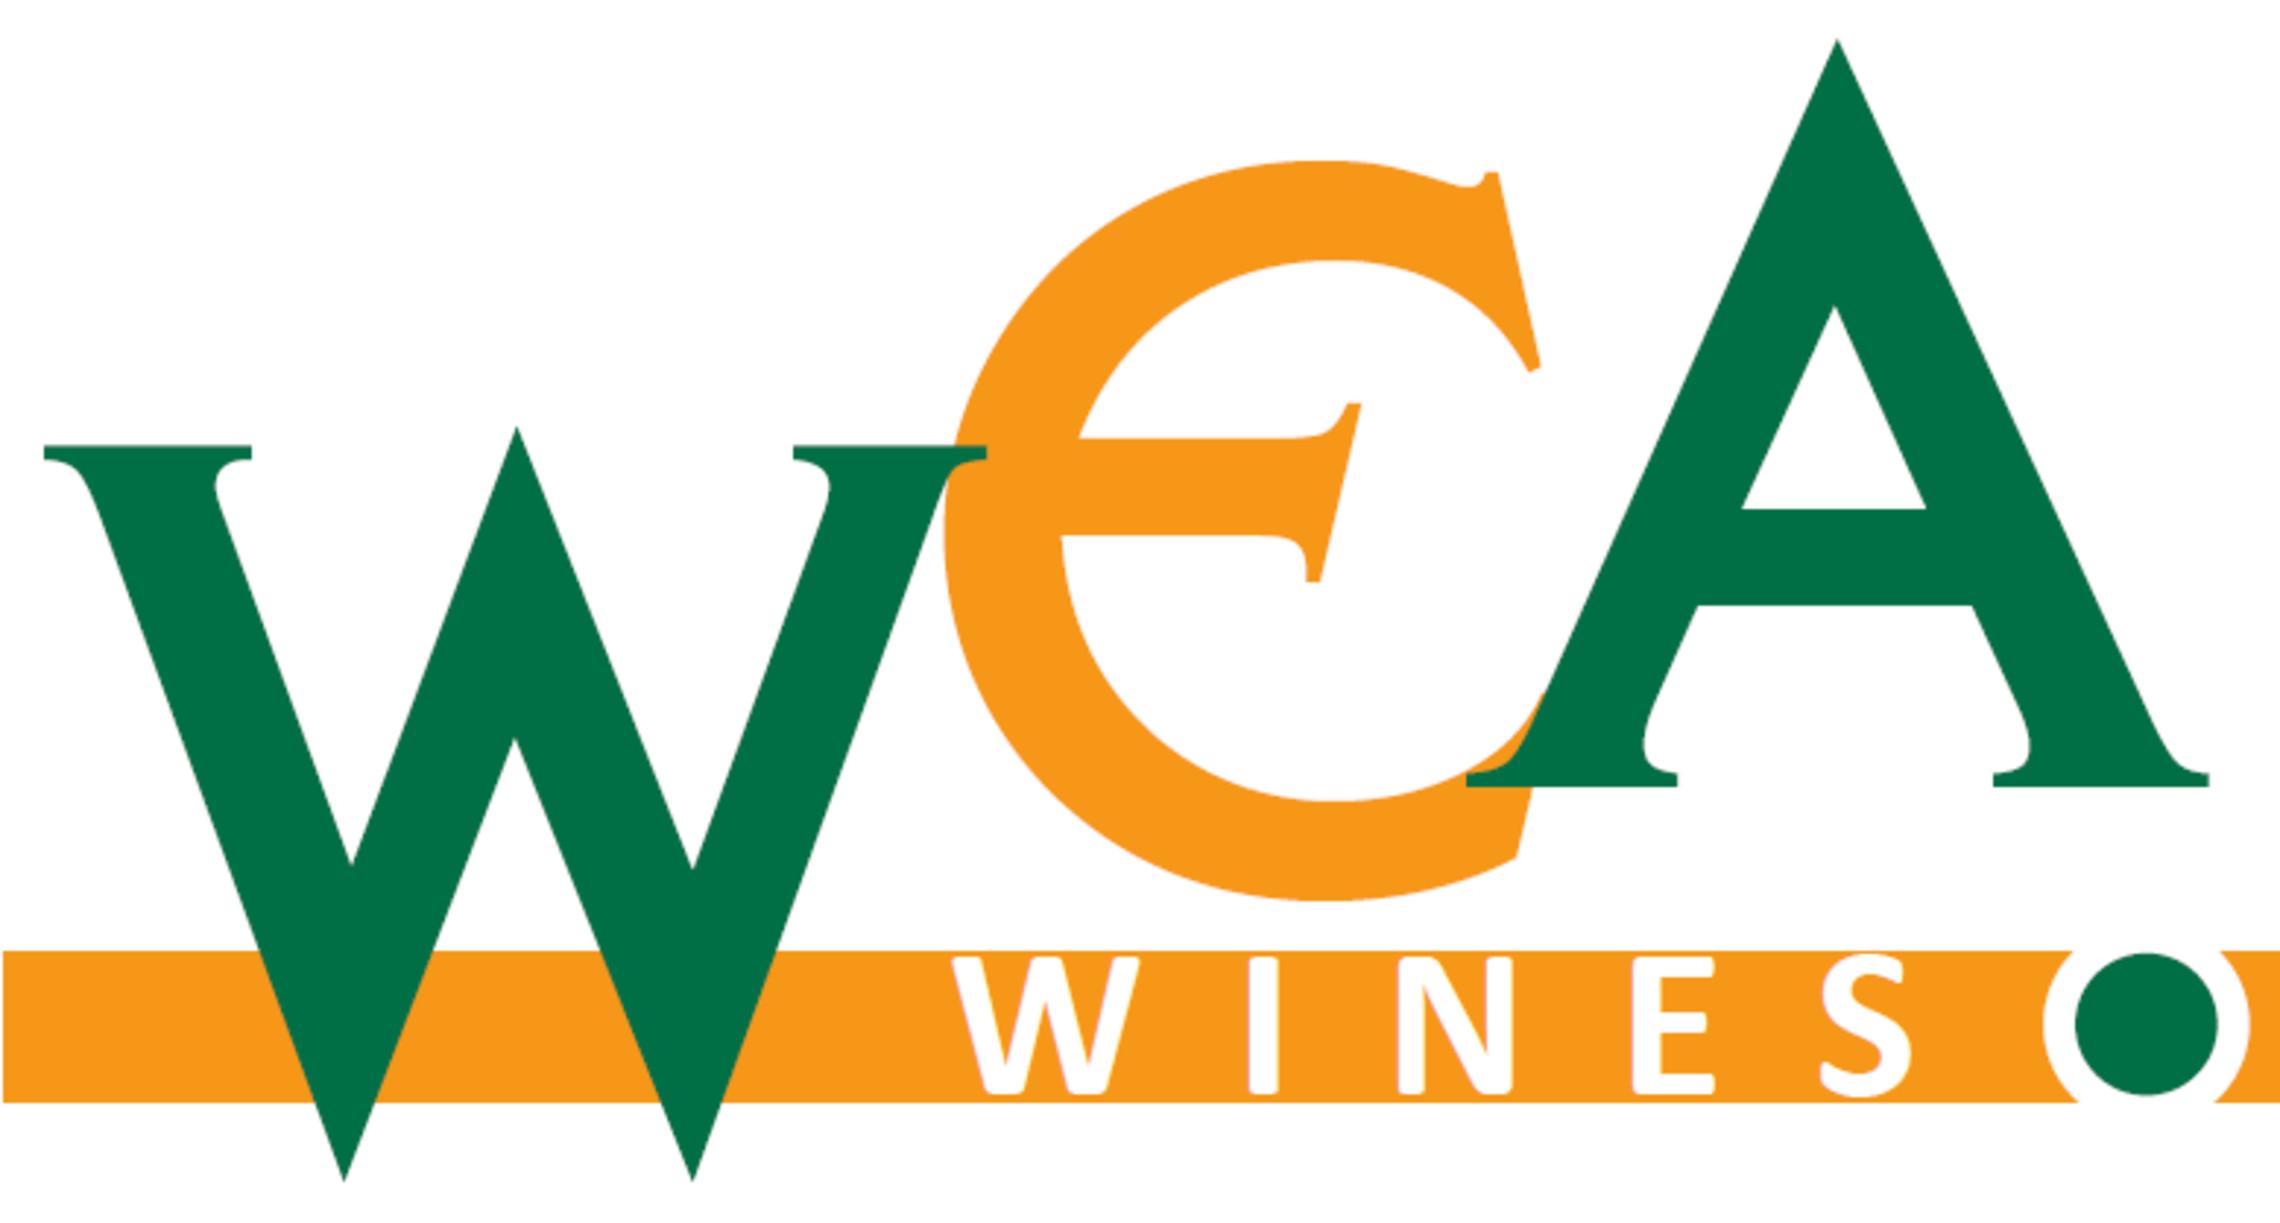 wea wines- company logo